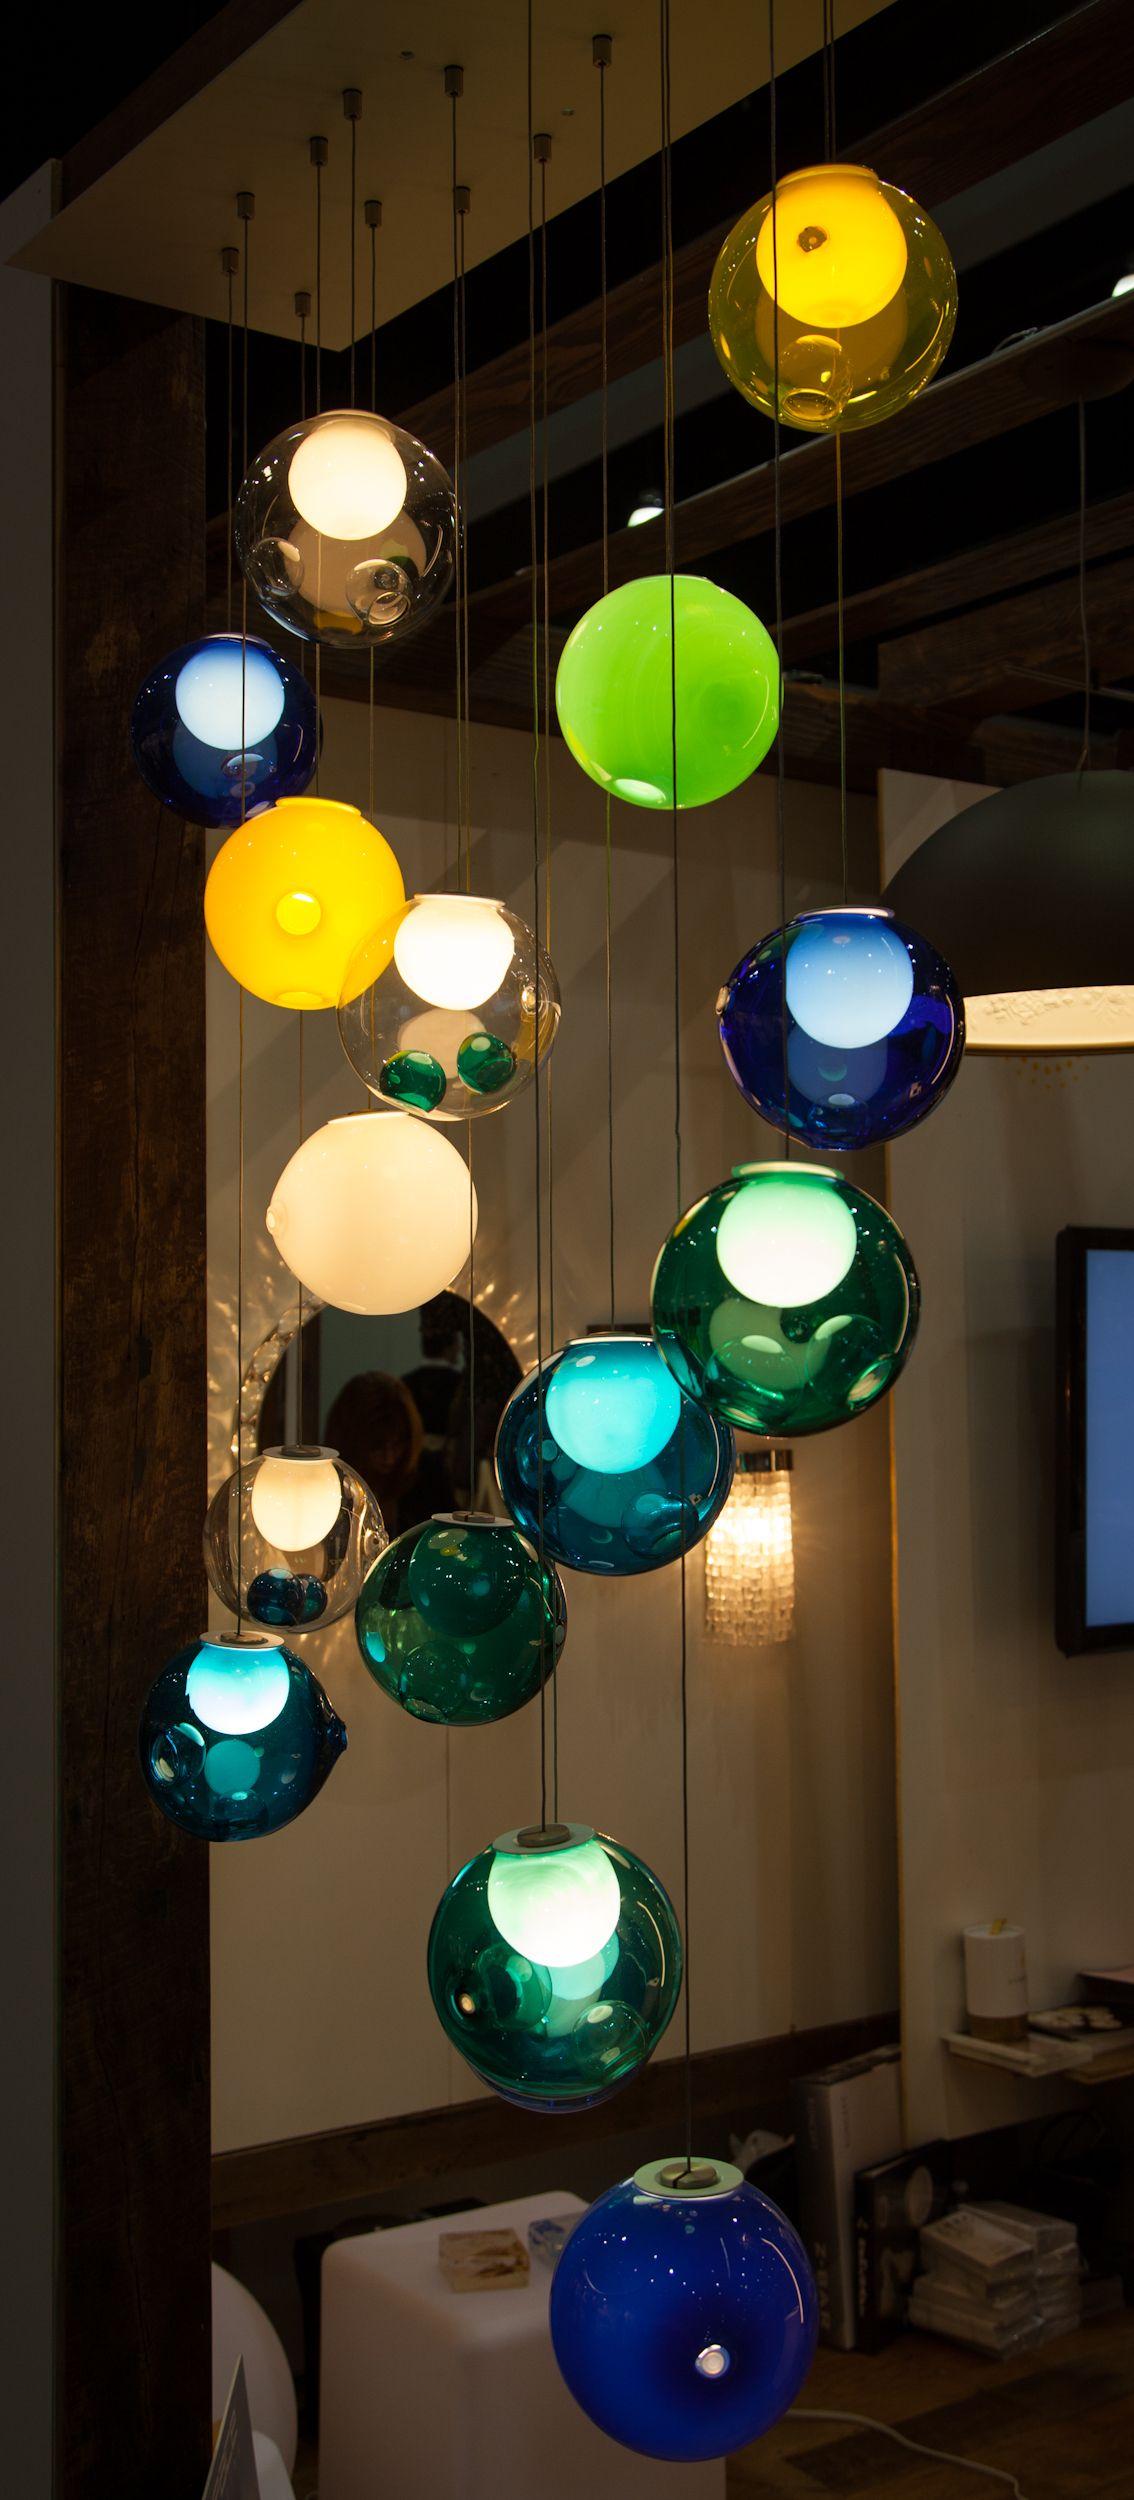 Ooh La La Love These Lights Lamp Light Sparkling Lights Lighting